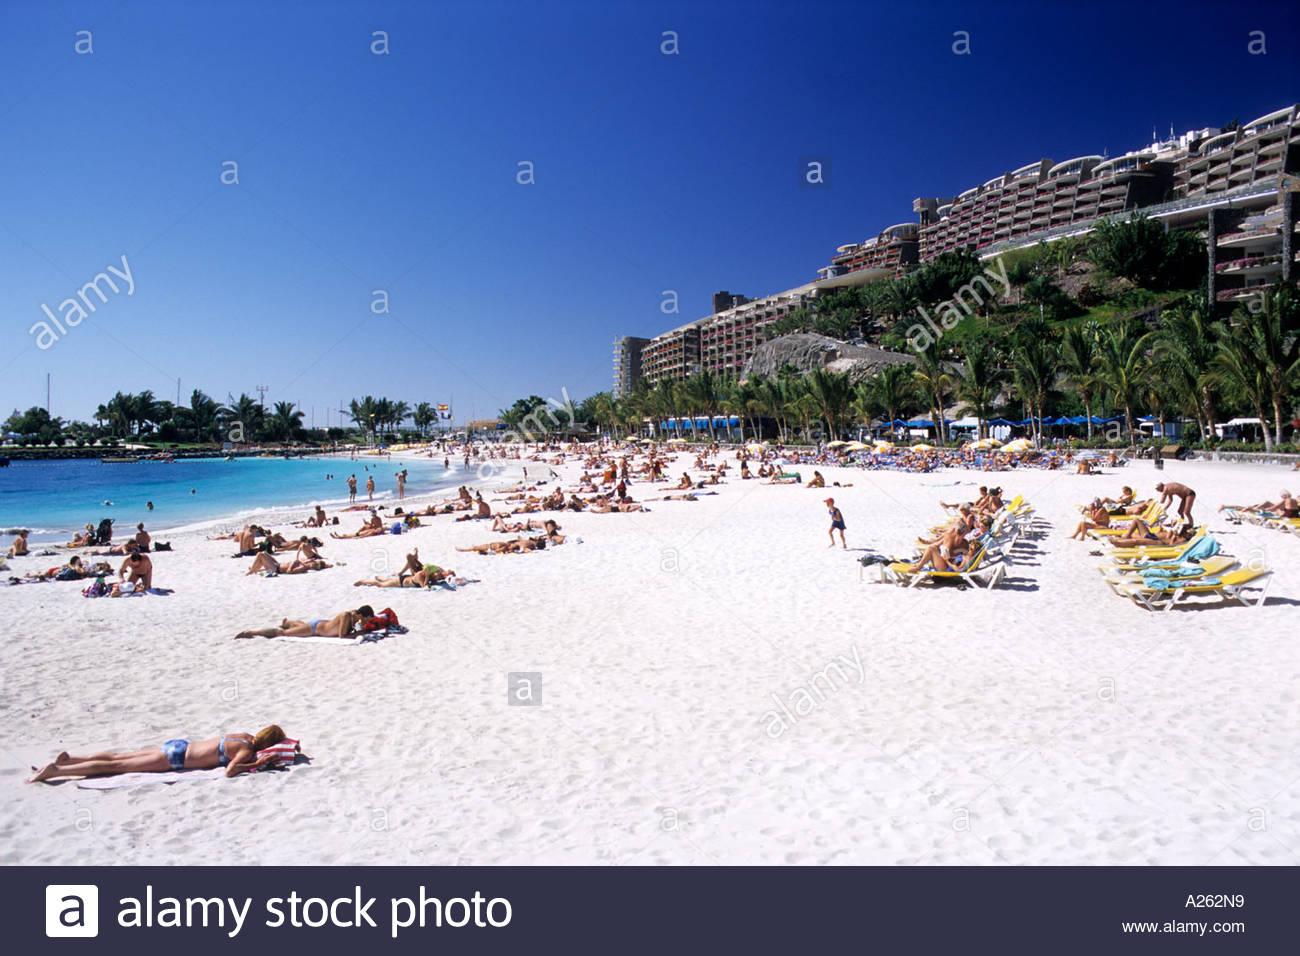 Luxury Beach Resort Canary Islands